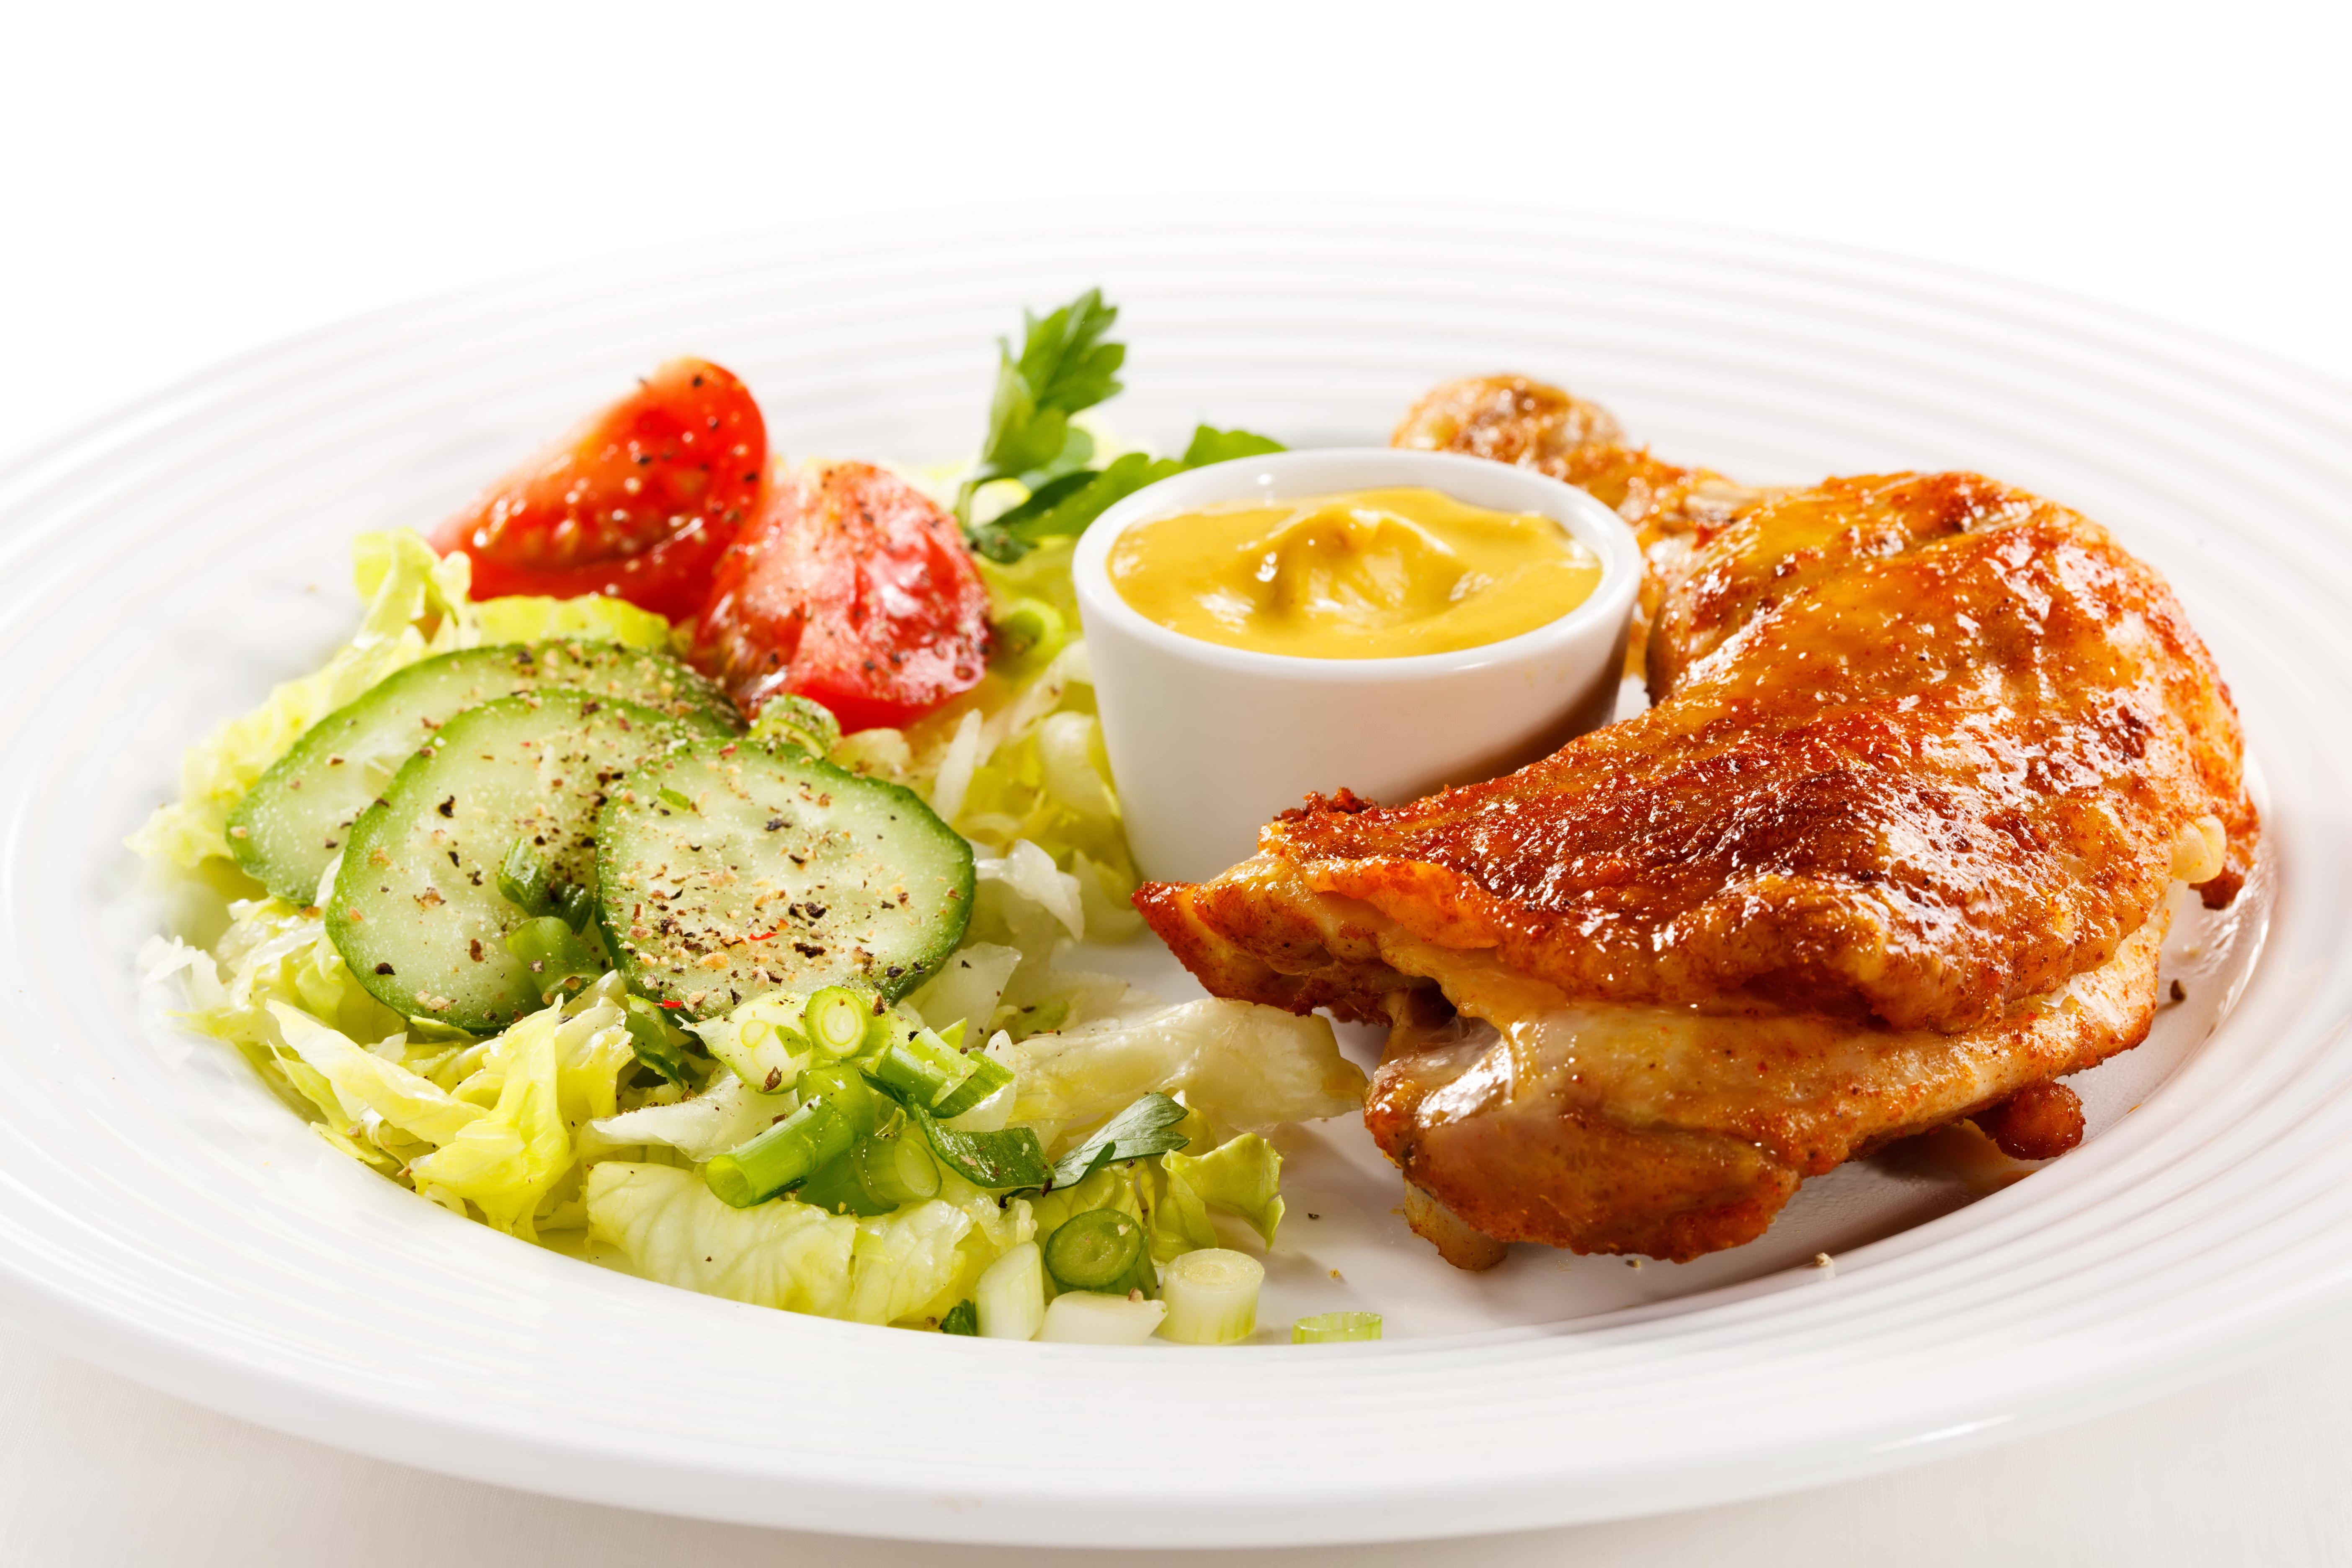 еда салаты рыба курица банкет  № 2124056 бесплатно